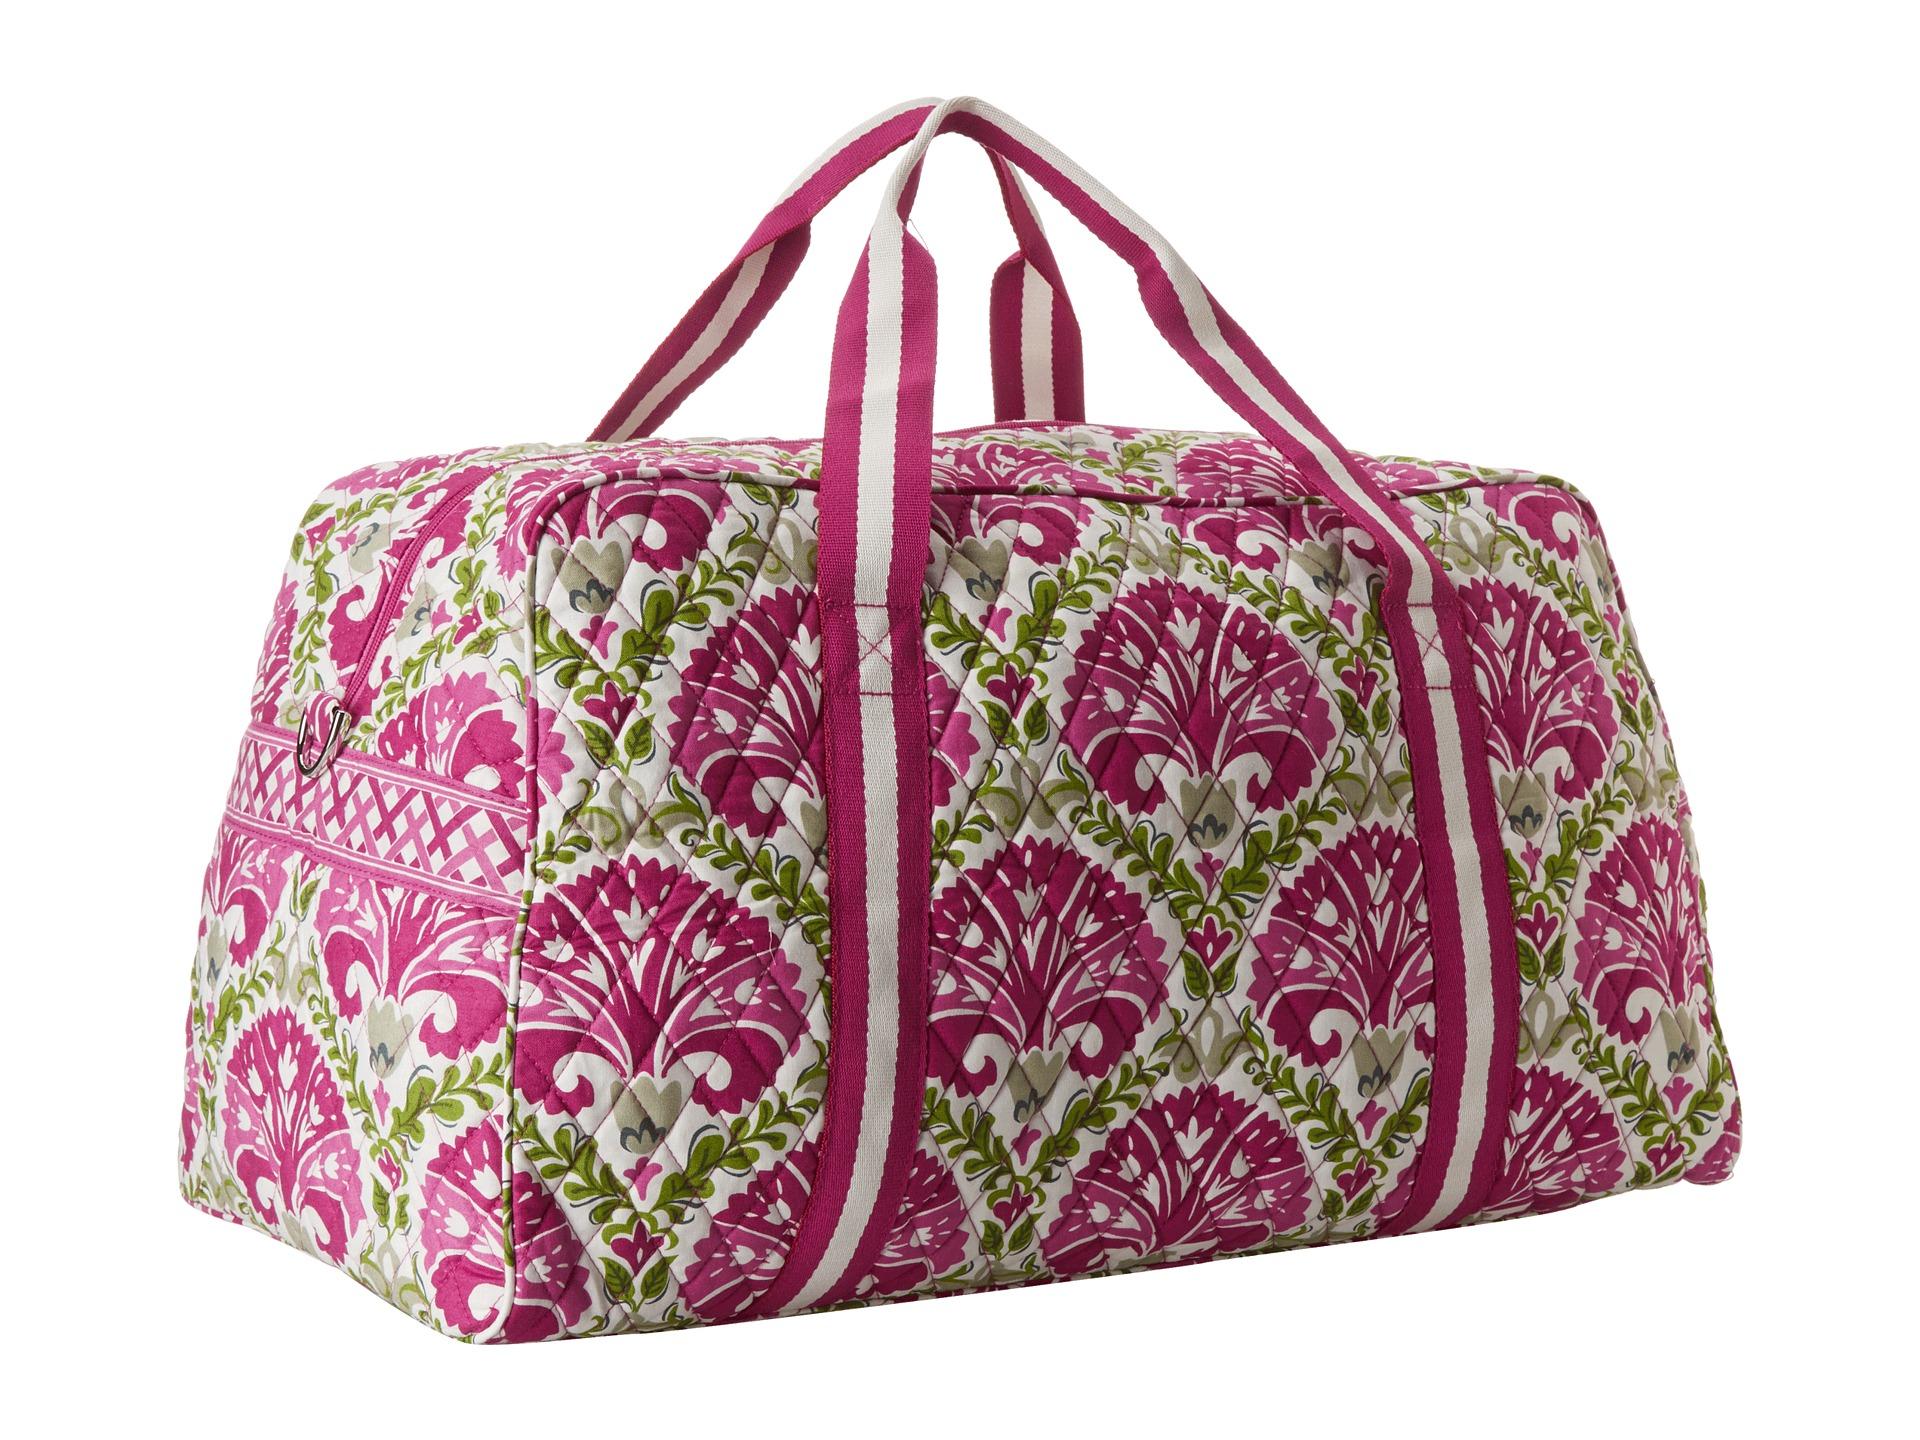 b17798216d5a Clearance Vera Bradley Travel Bags